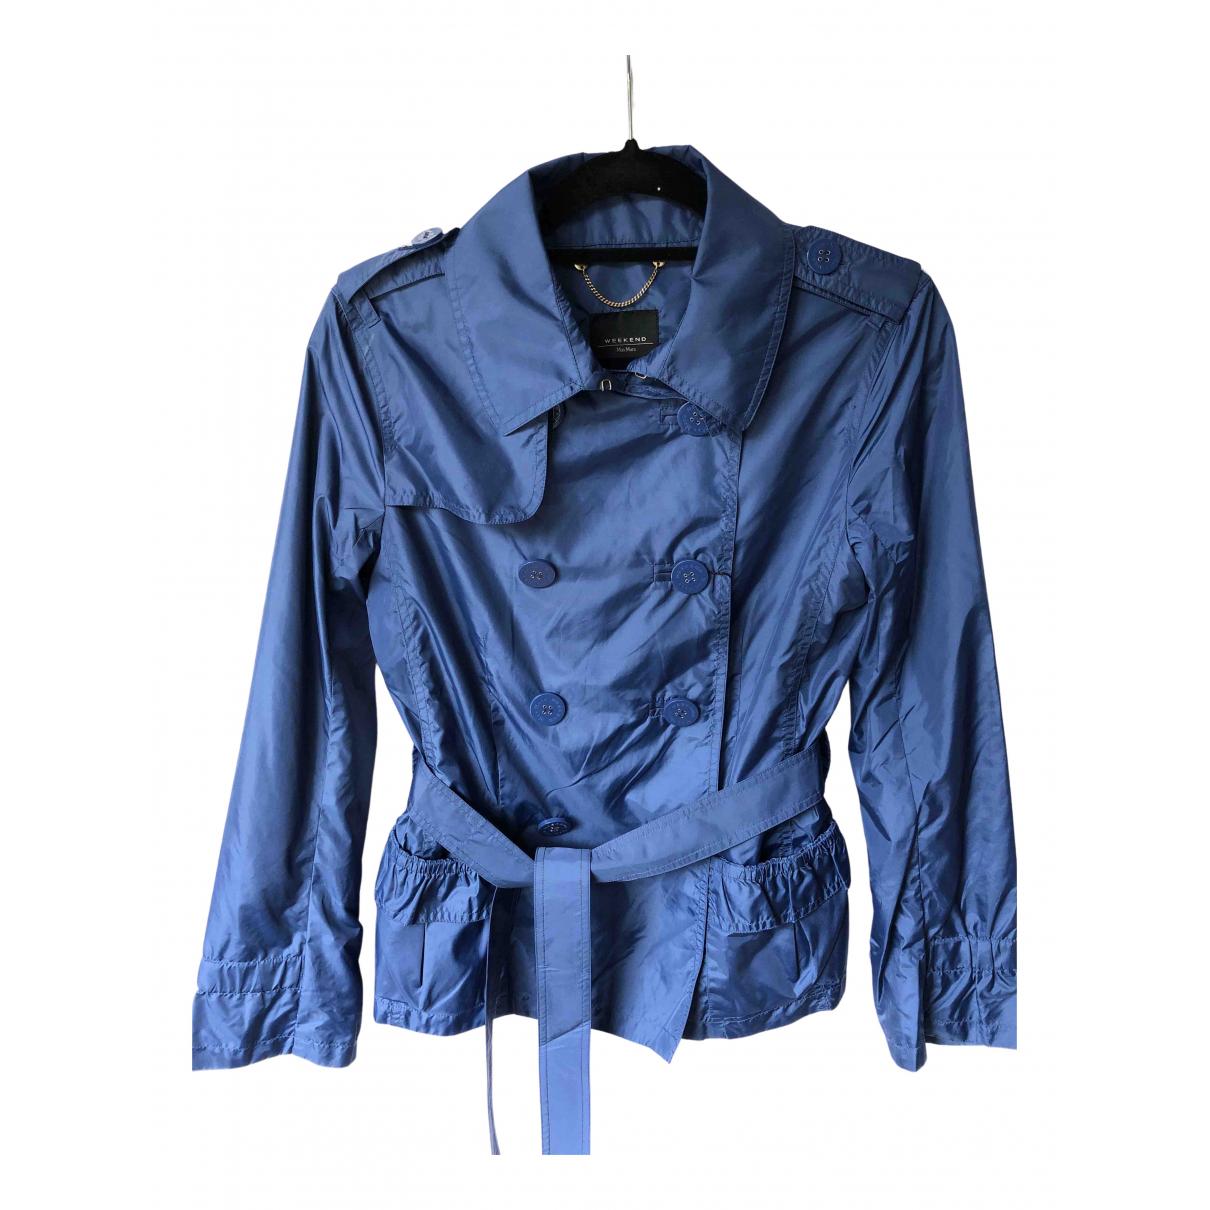 Max Mara Weekend \N Jacke in  Blau Polyester